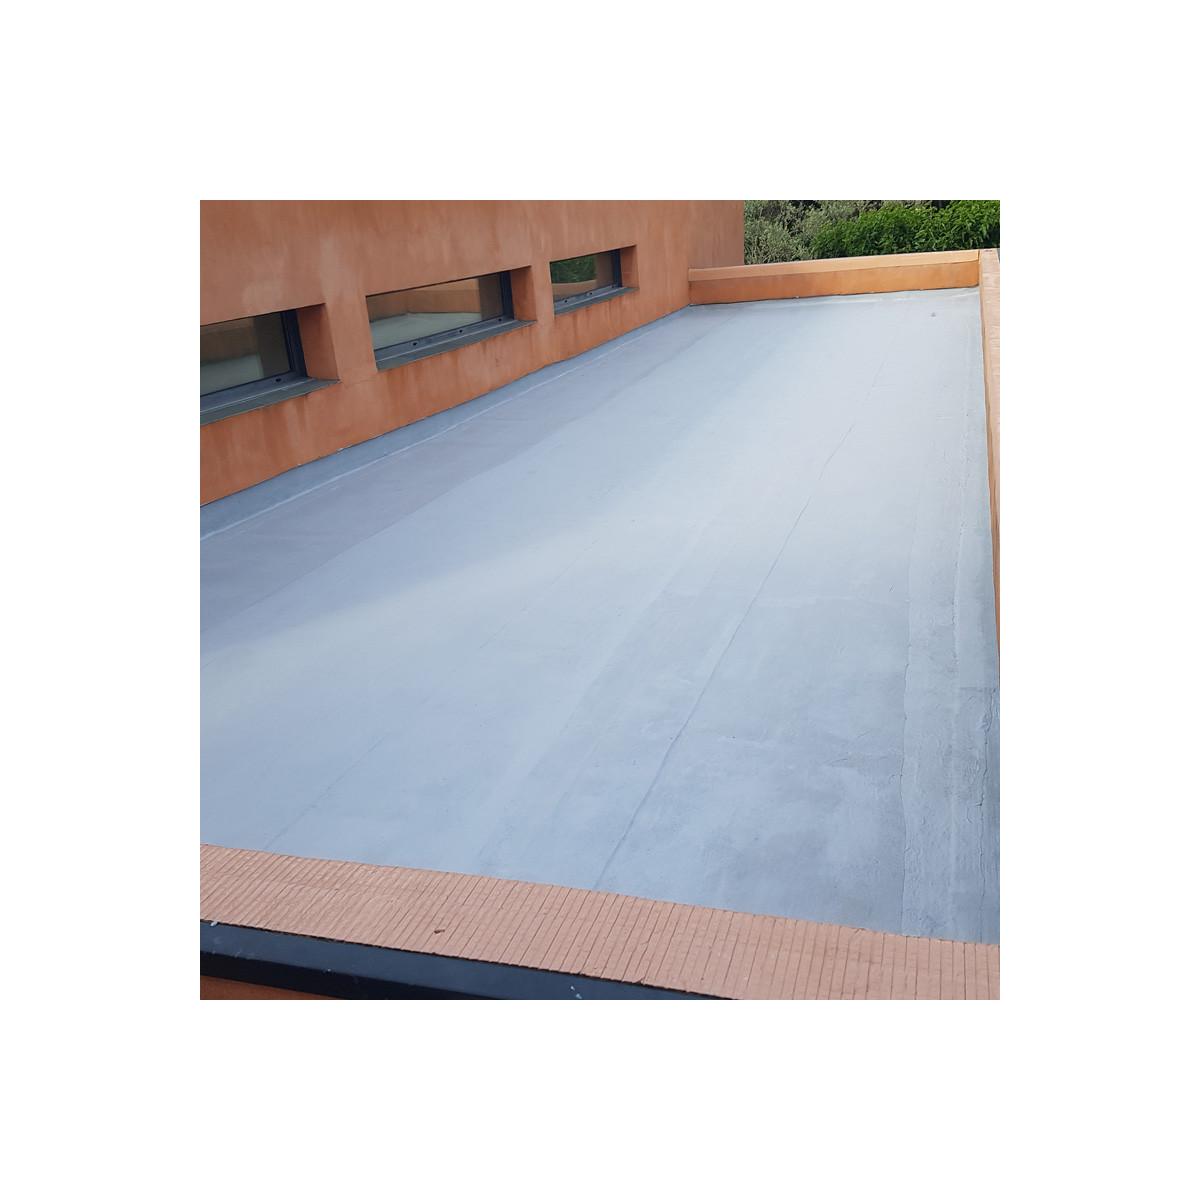 produit tanch it toit plat terrasse r sine arcathan. Black Bedroom Furniture Sets. Home Design Ideas